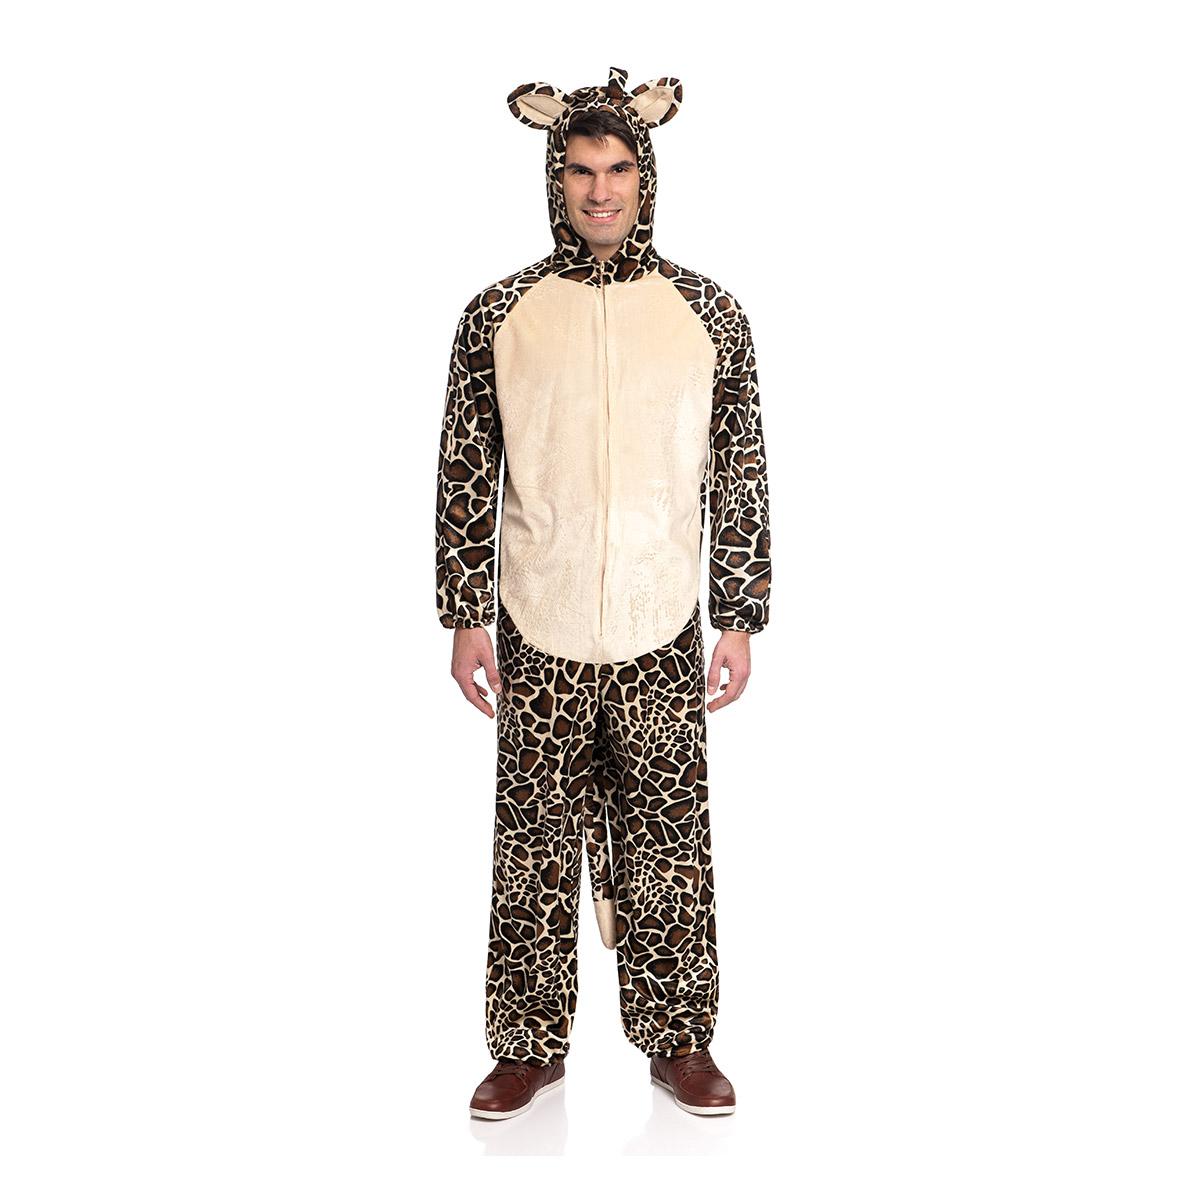 giraffen kost m herren praktisch bequemer overall. Black Bedroom Furniture Sets. Home Design Ideas